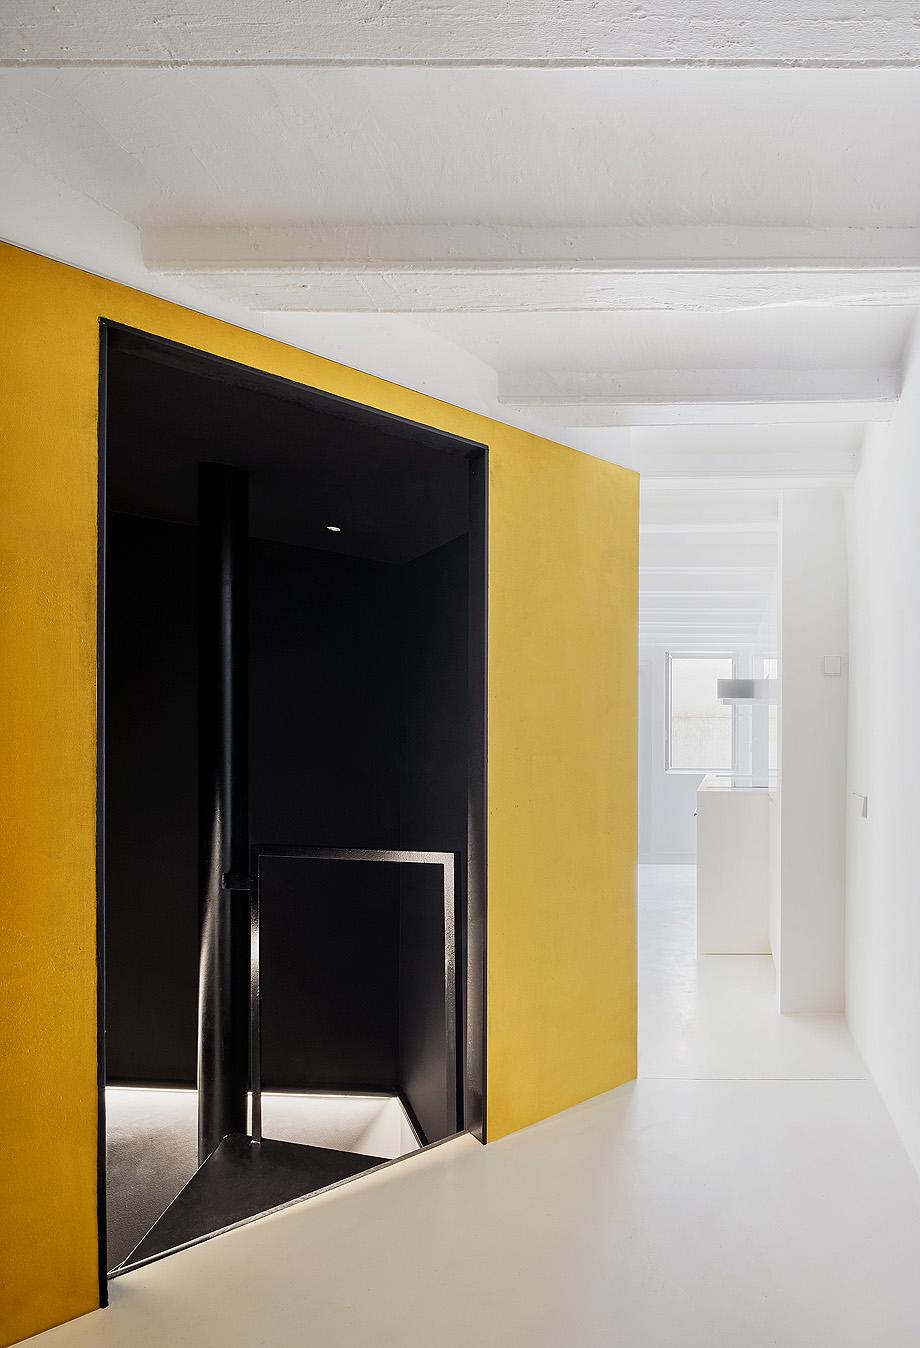 dúplex tibbaut de ras arquitectura (2)